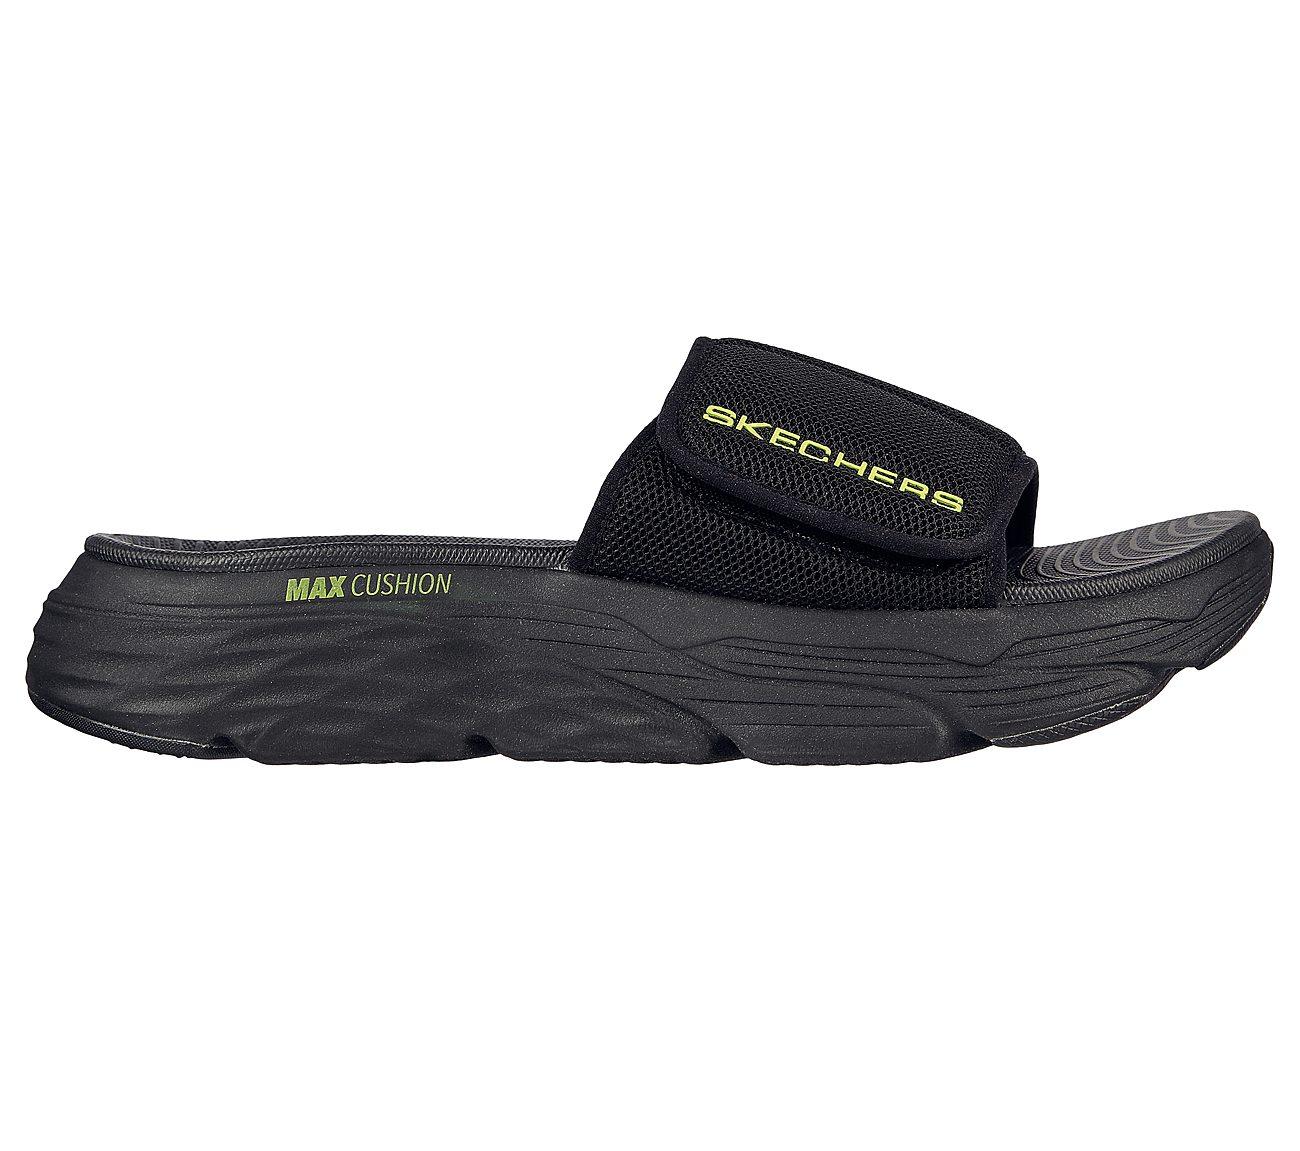 SKECHERS Skechers Max Cushioning Slide